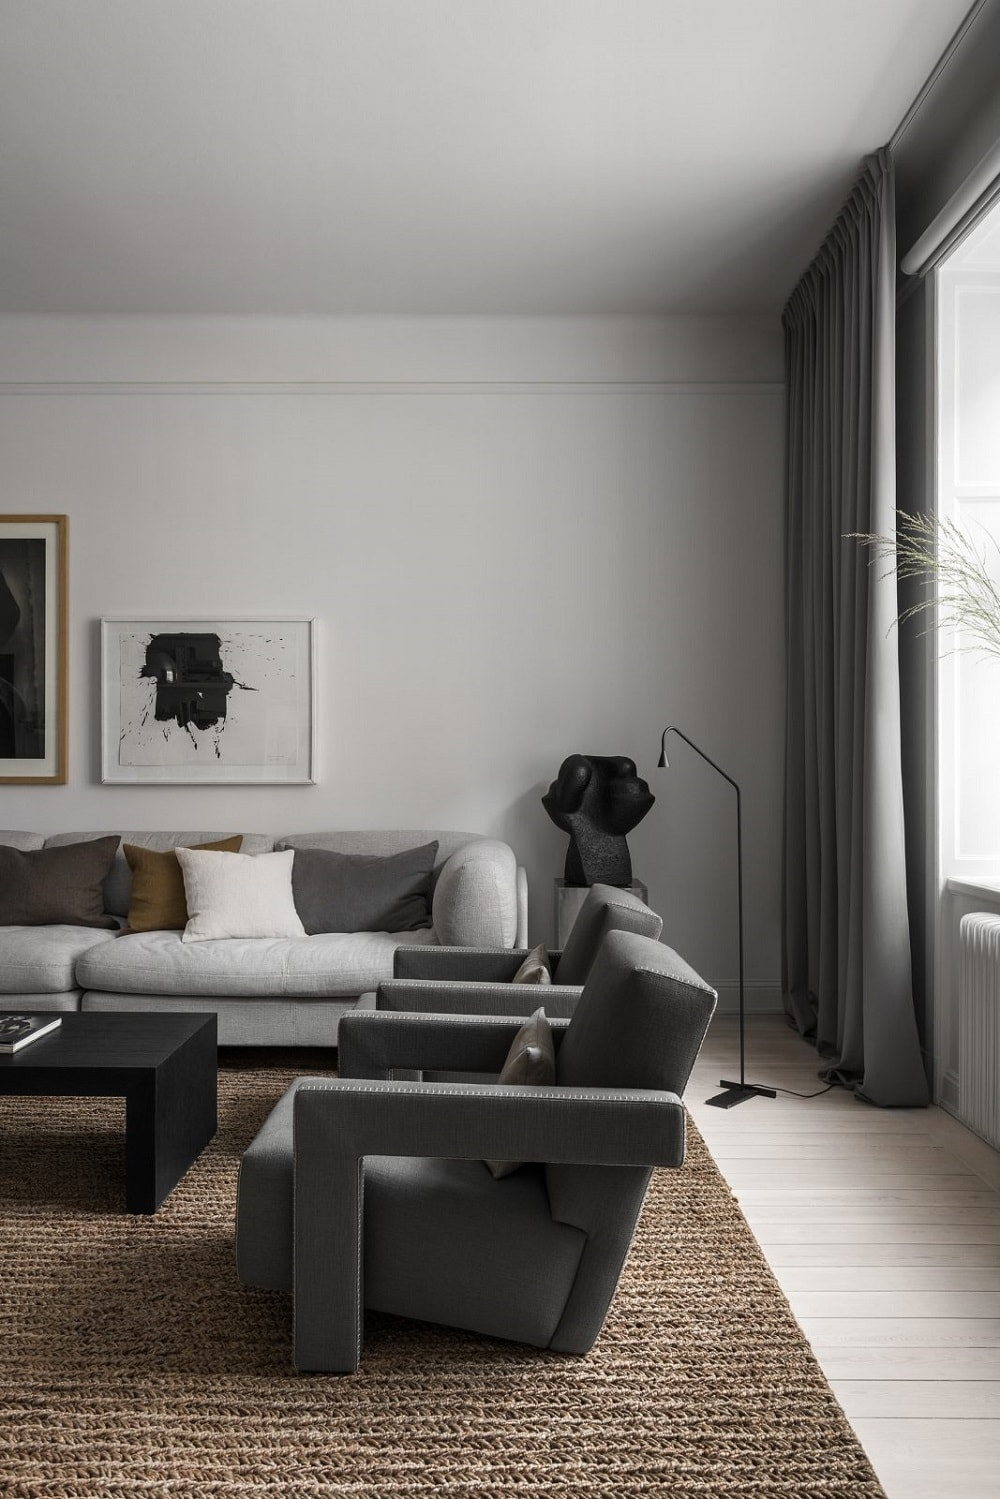 Gerrit Rietveld为Cassina设计的637张乌得勒支扶手椅。 DUX沙发。 Bo Arenander的釉面陶瓷雕塑